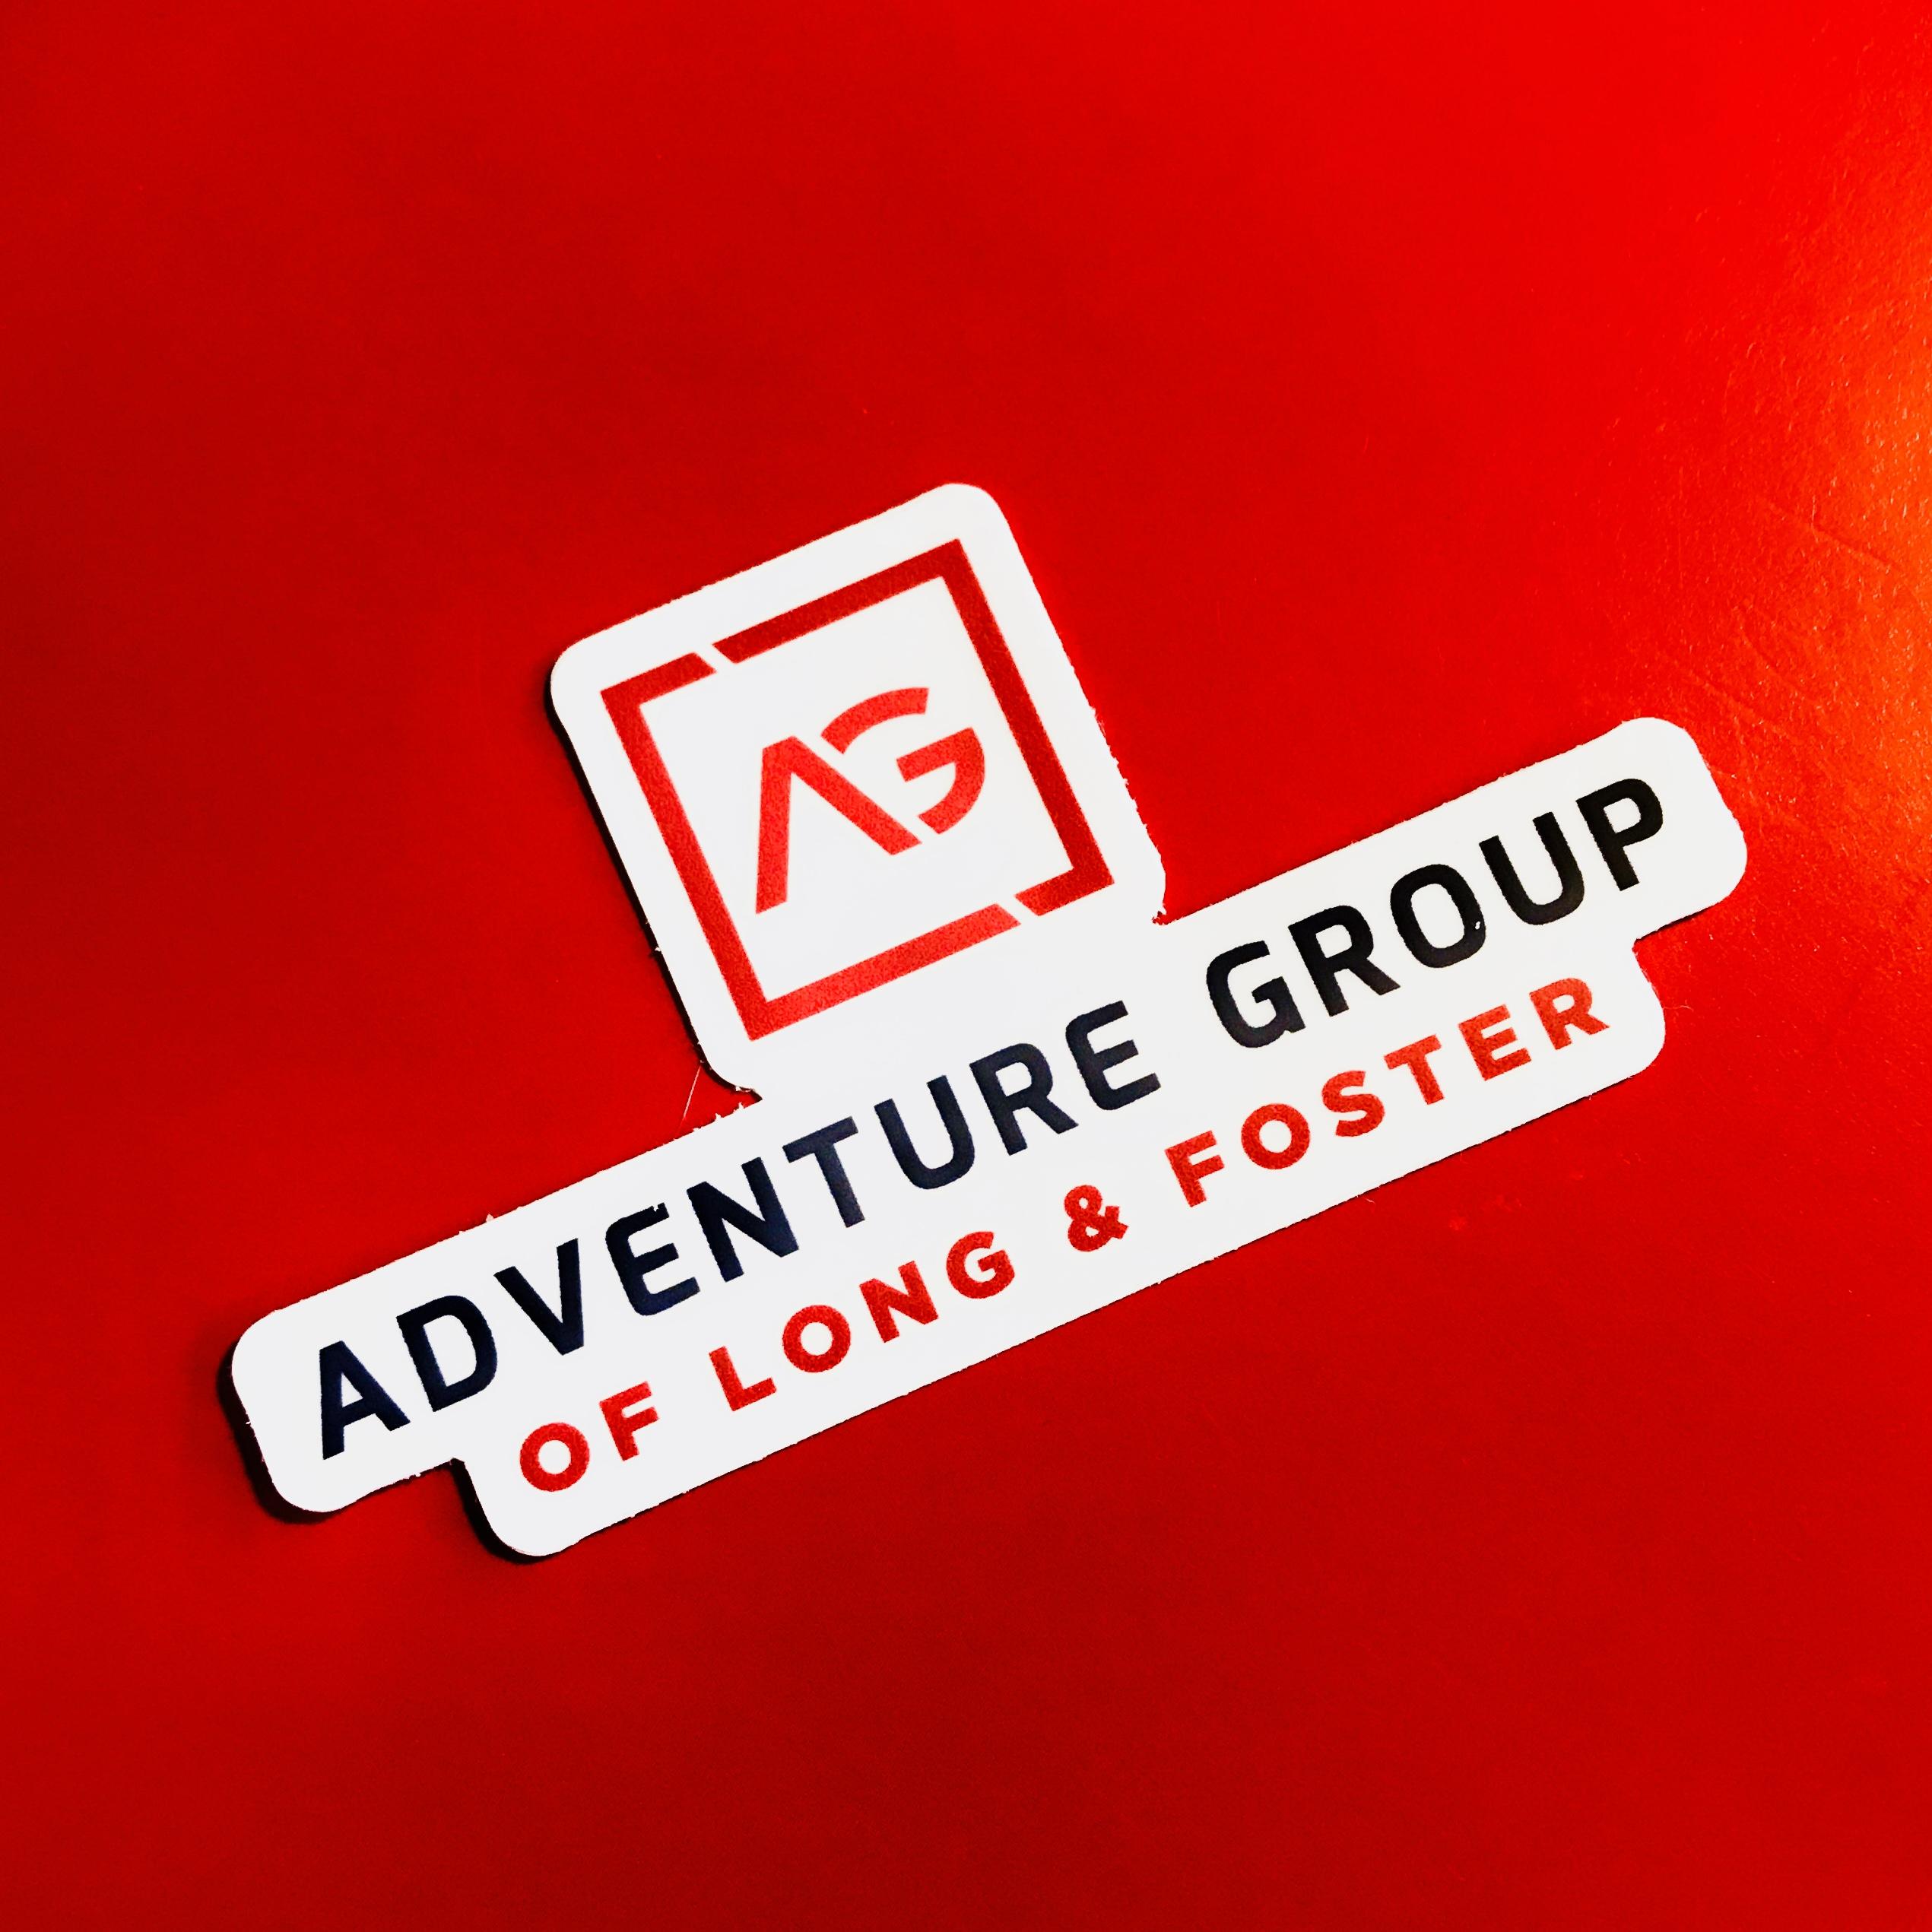 Adventure Group Logo